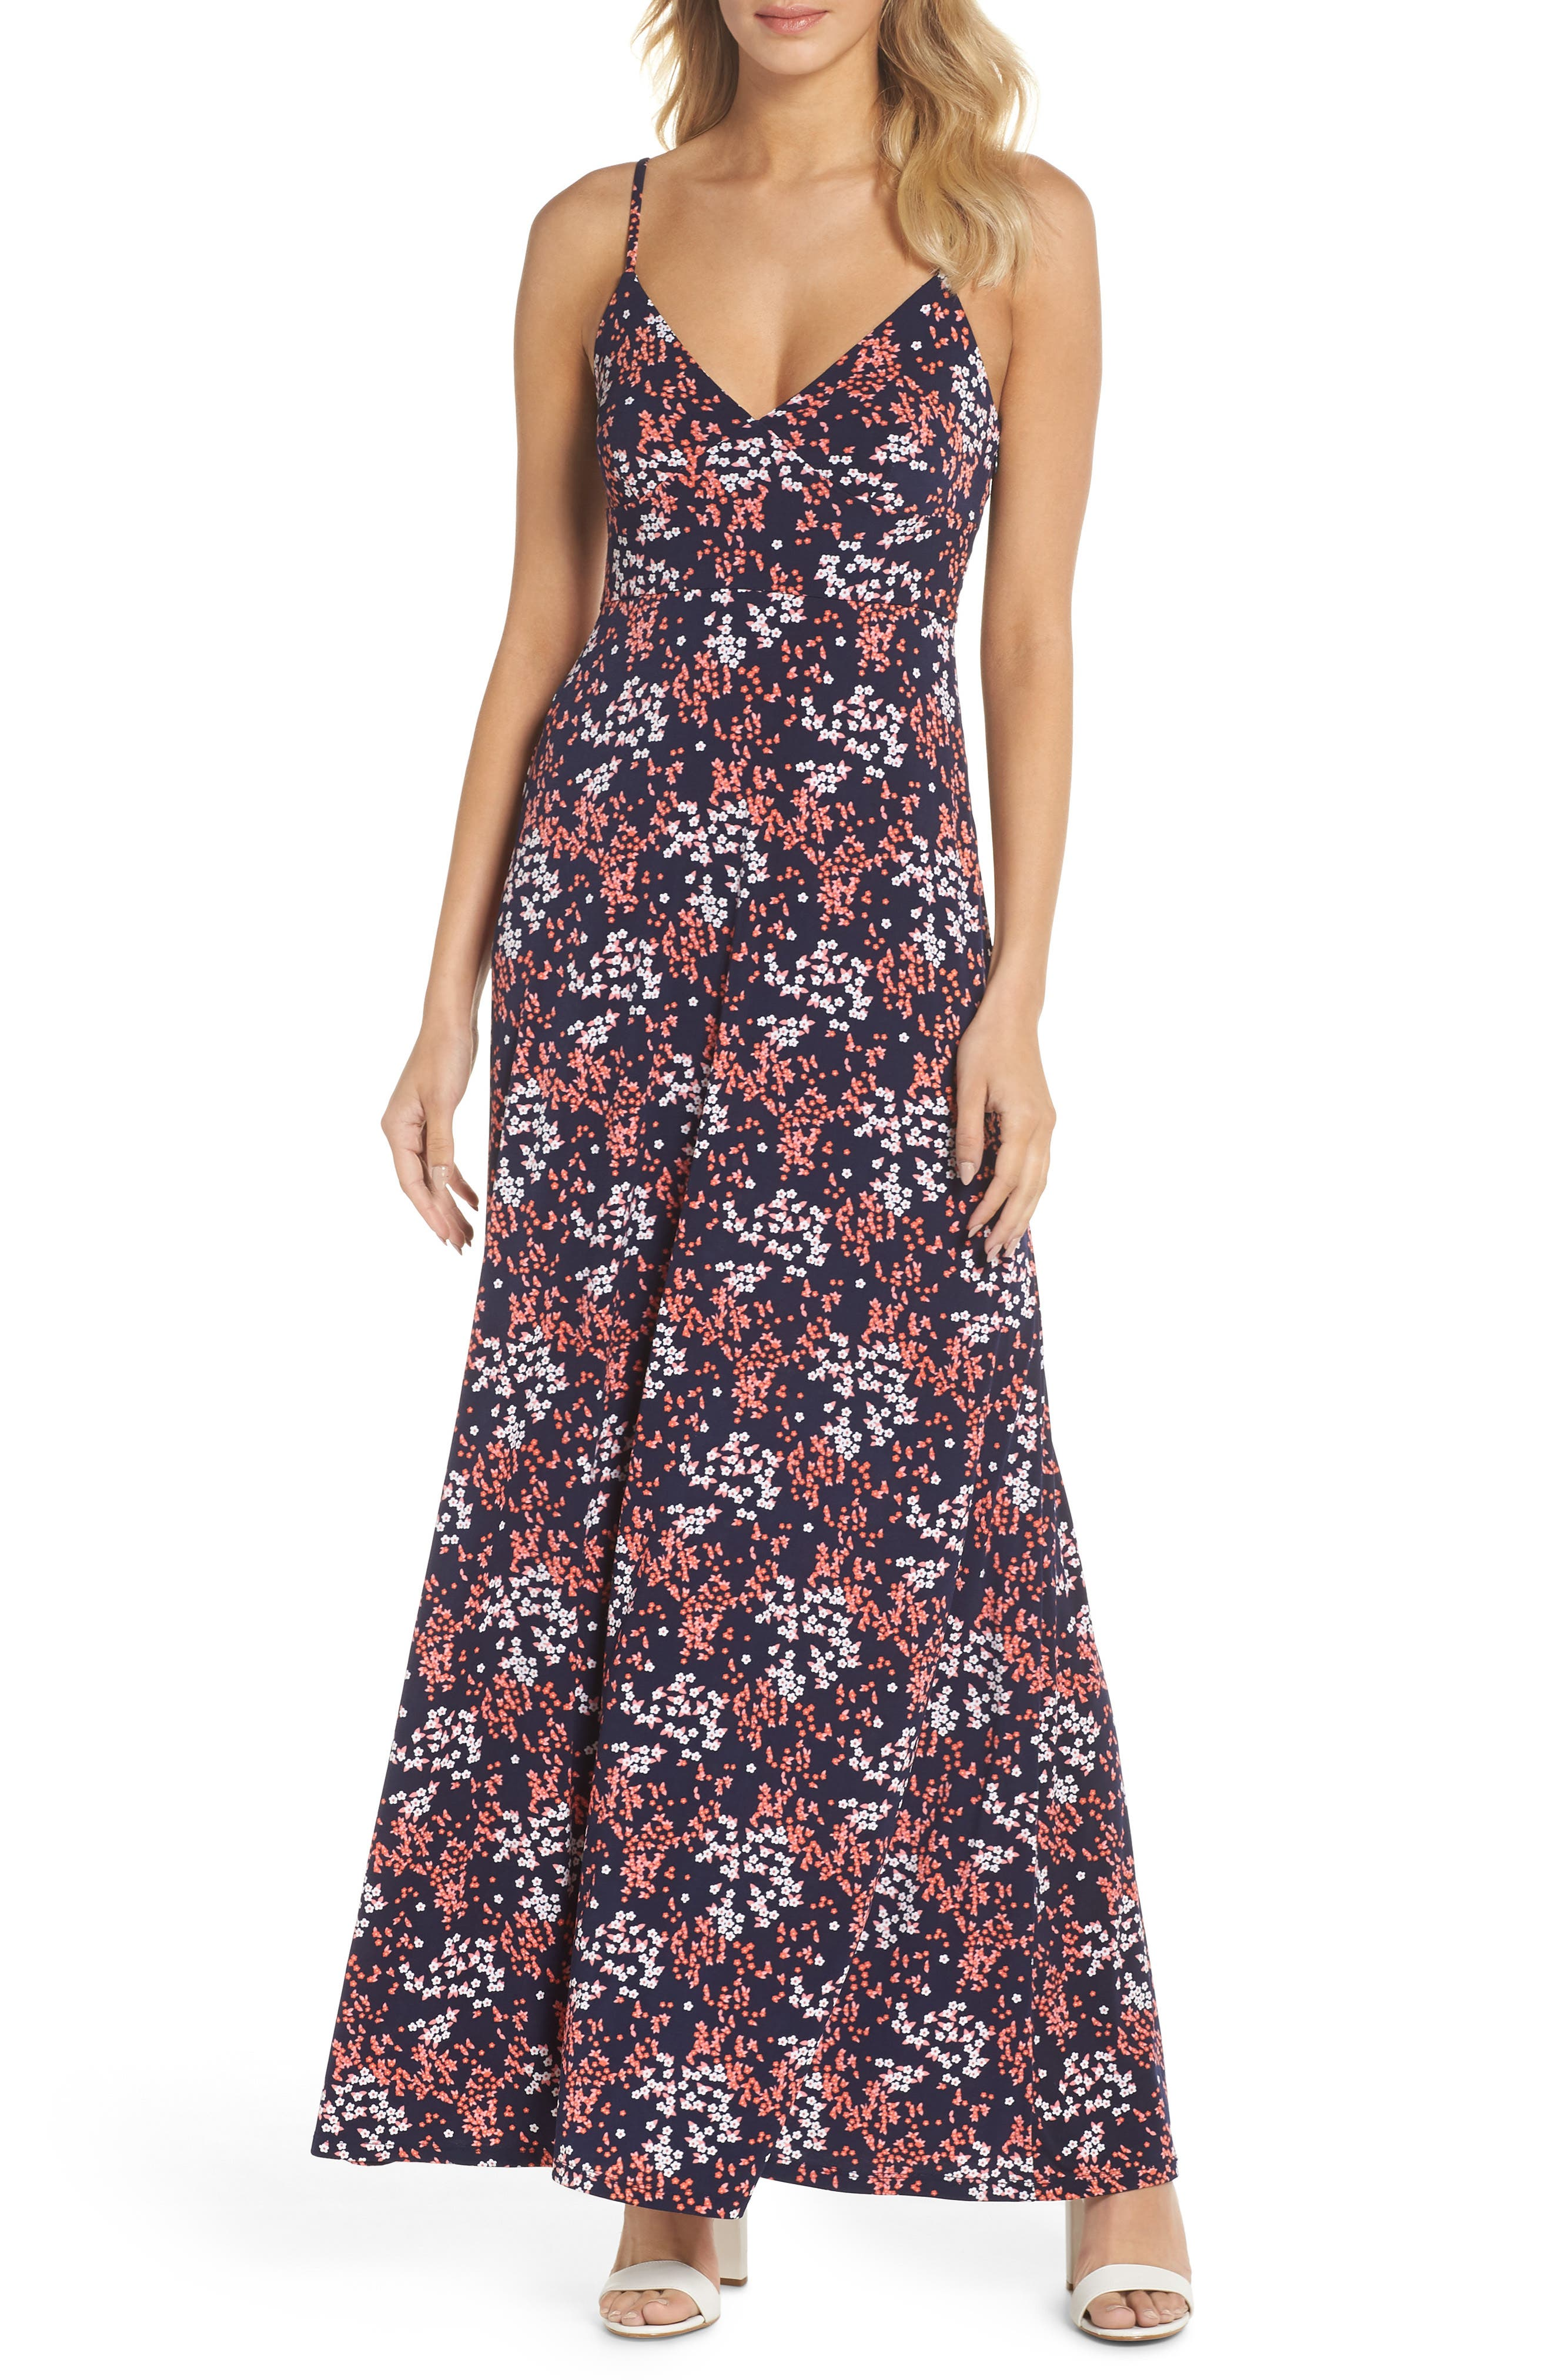 Bloom Maxi Dress,                             Main thumbnail 1, color,                             True Navy/ Bight Blush